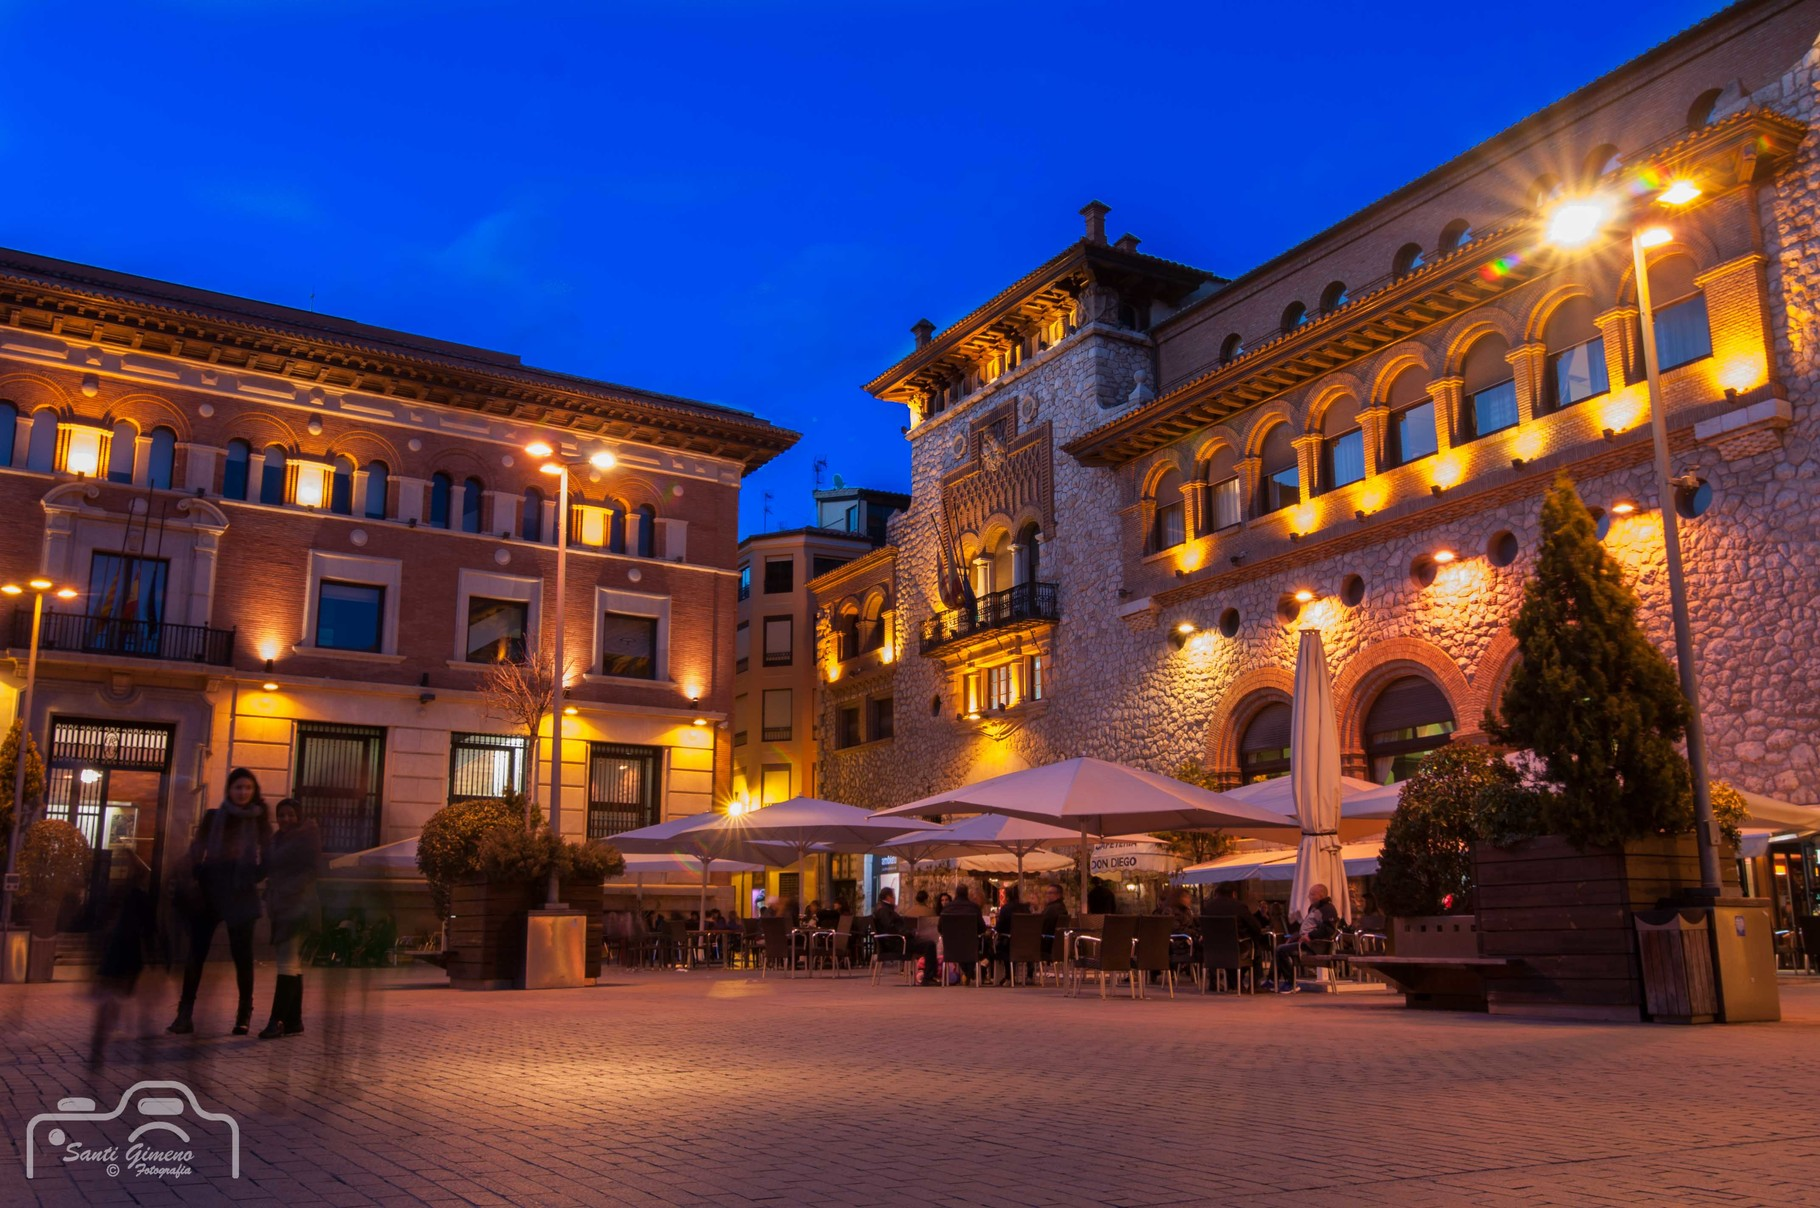 Plaza San Juan, Teruel